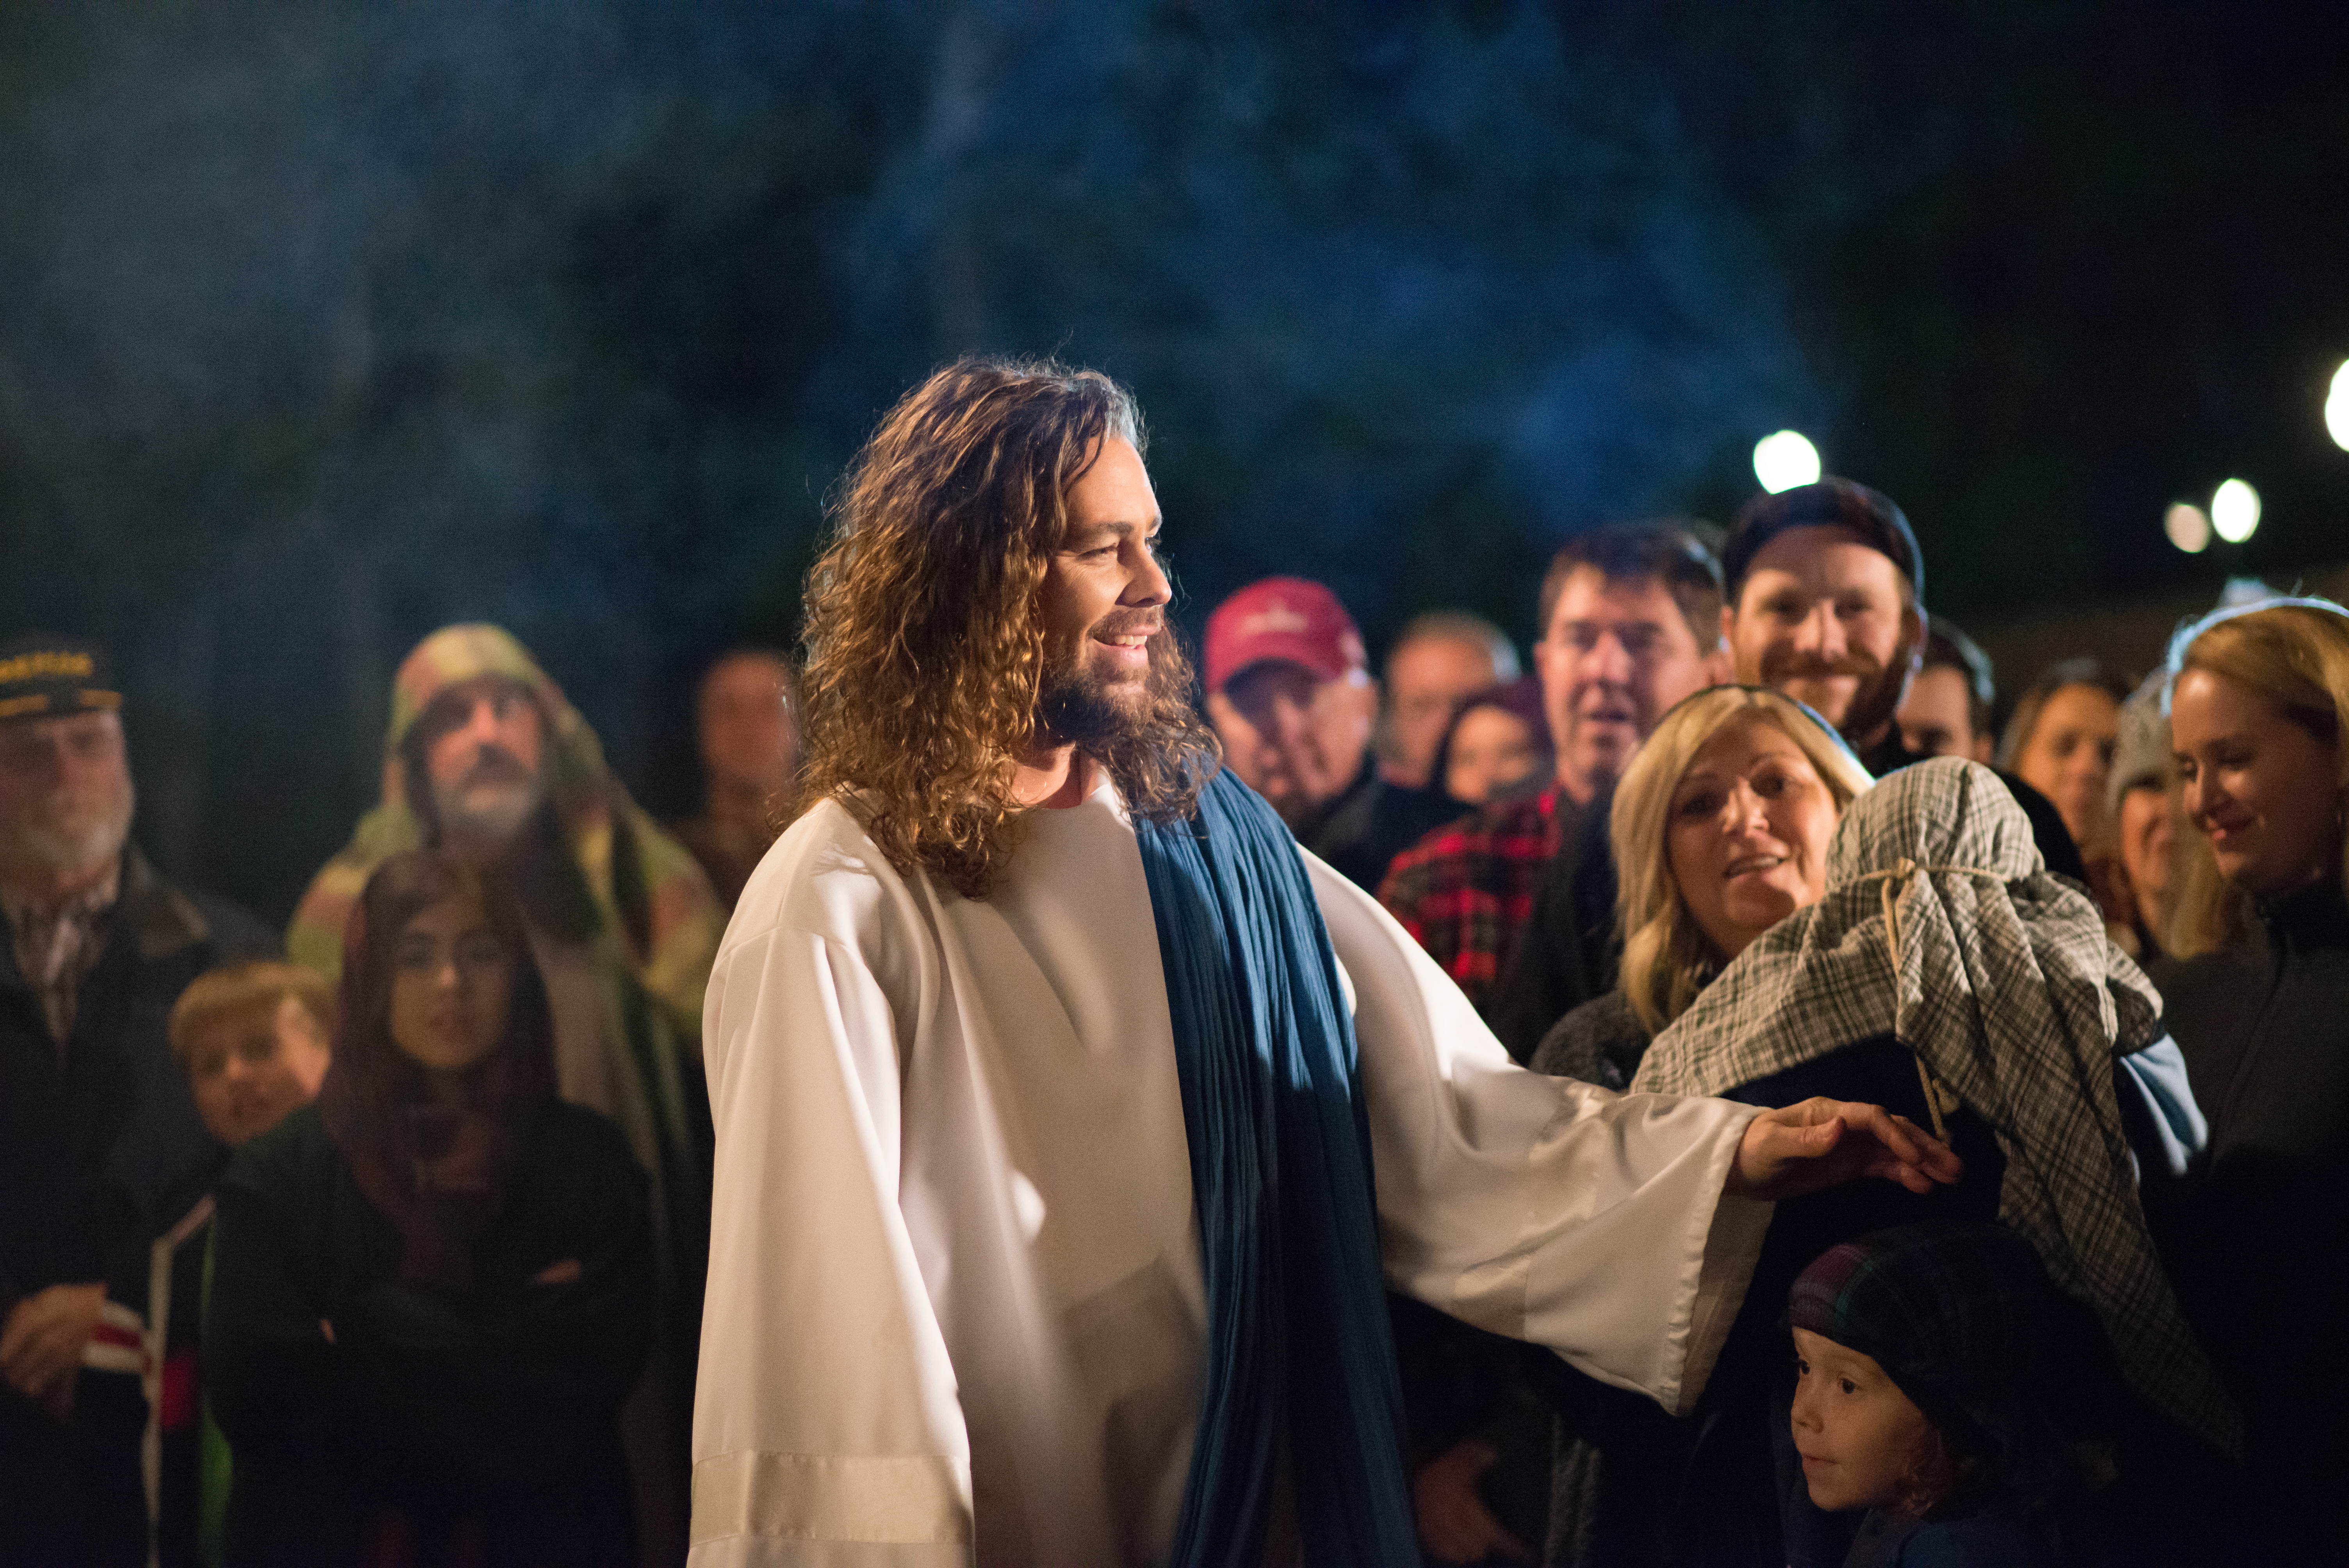 11-29-19_BethlehemLive-59